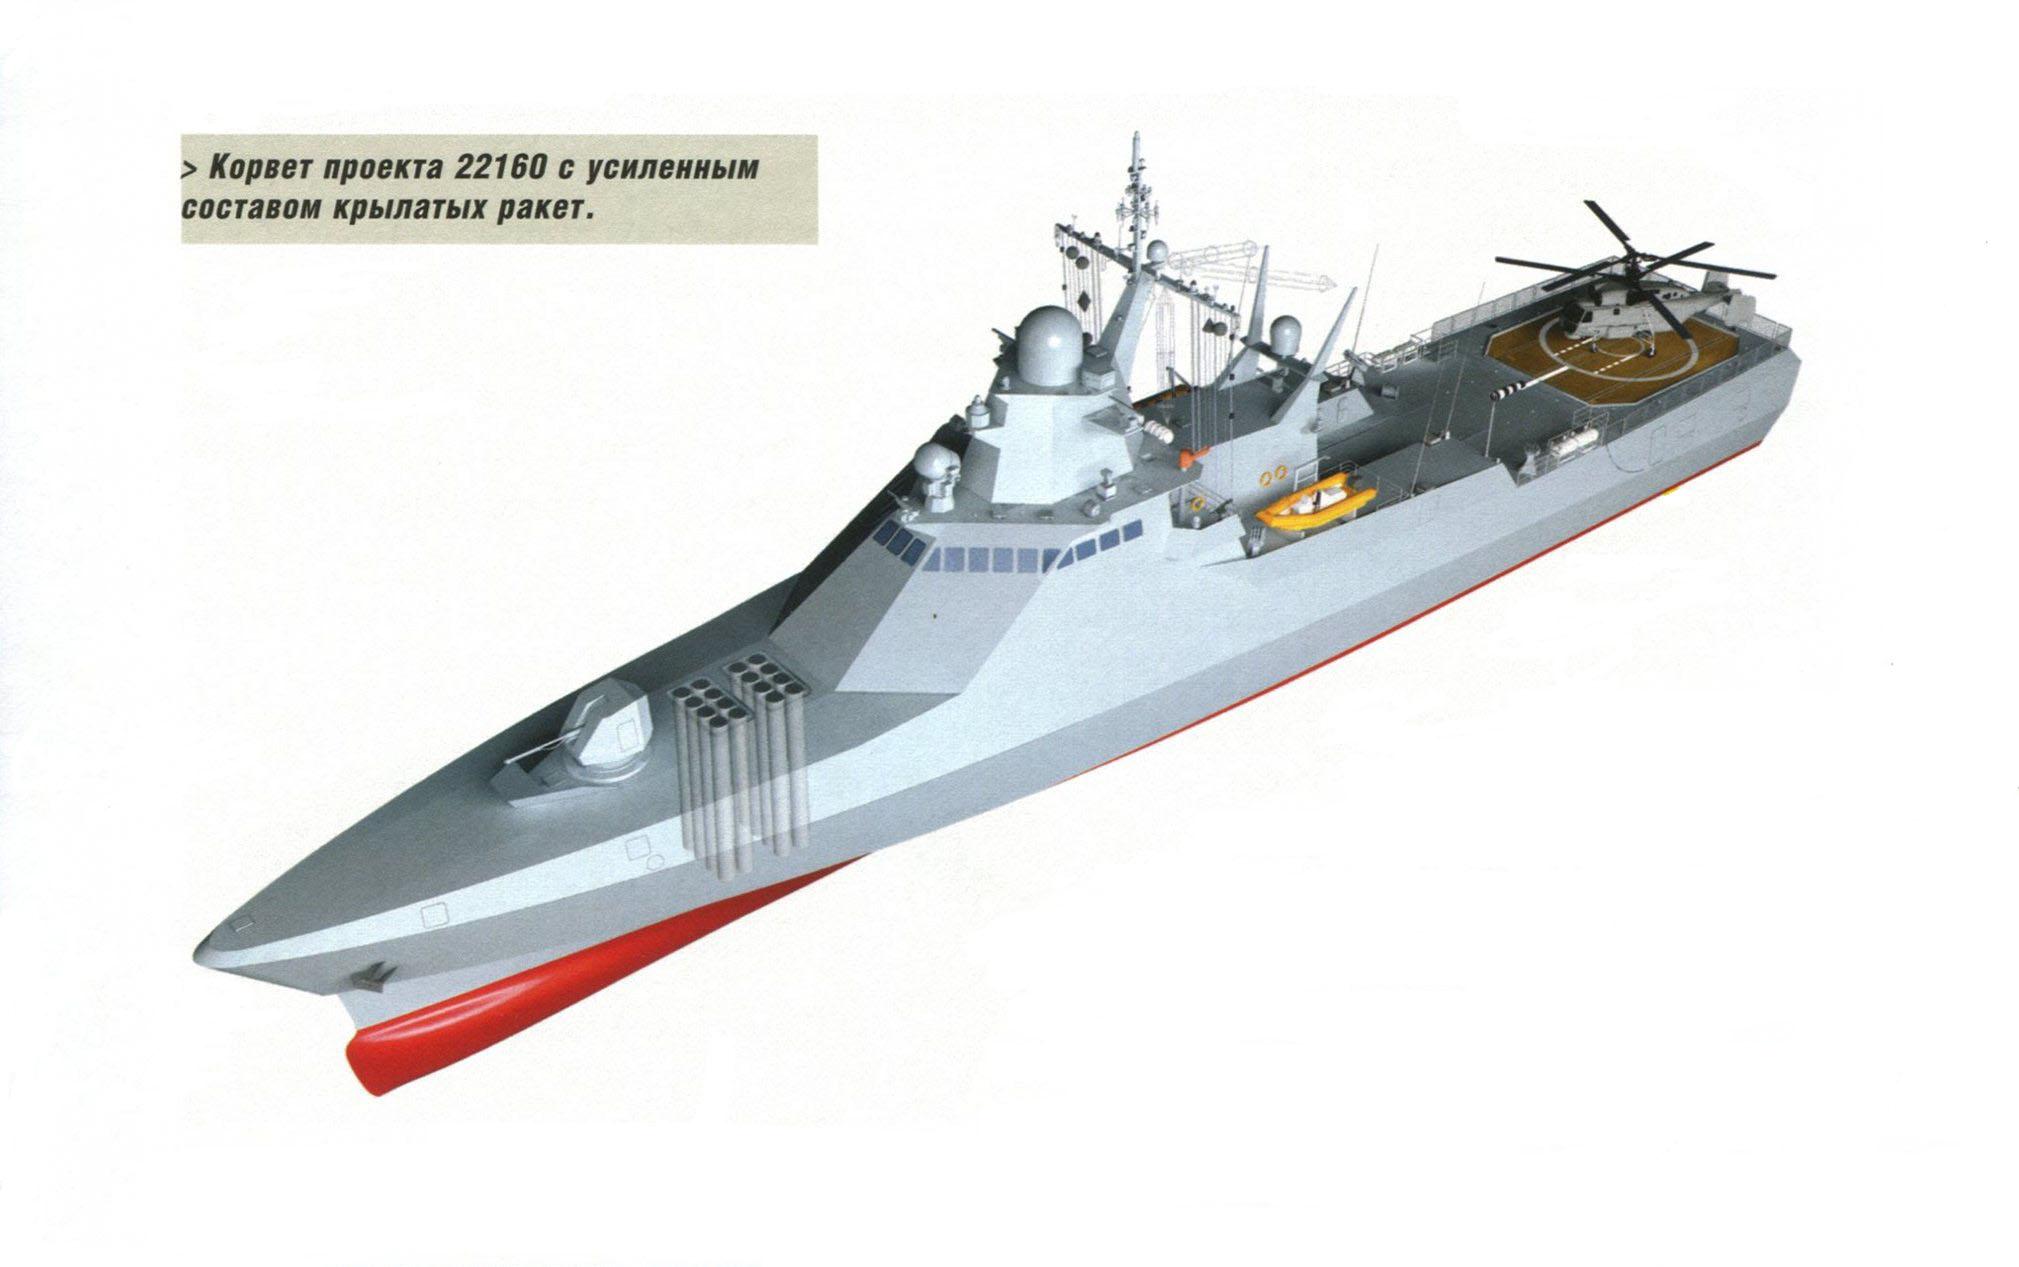 Project 22160 Bykov-class patrol ship - Page 6 02-5145073-22160-s-usilennym-sostavom-raket